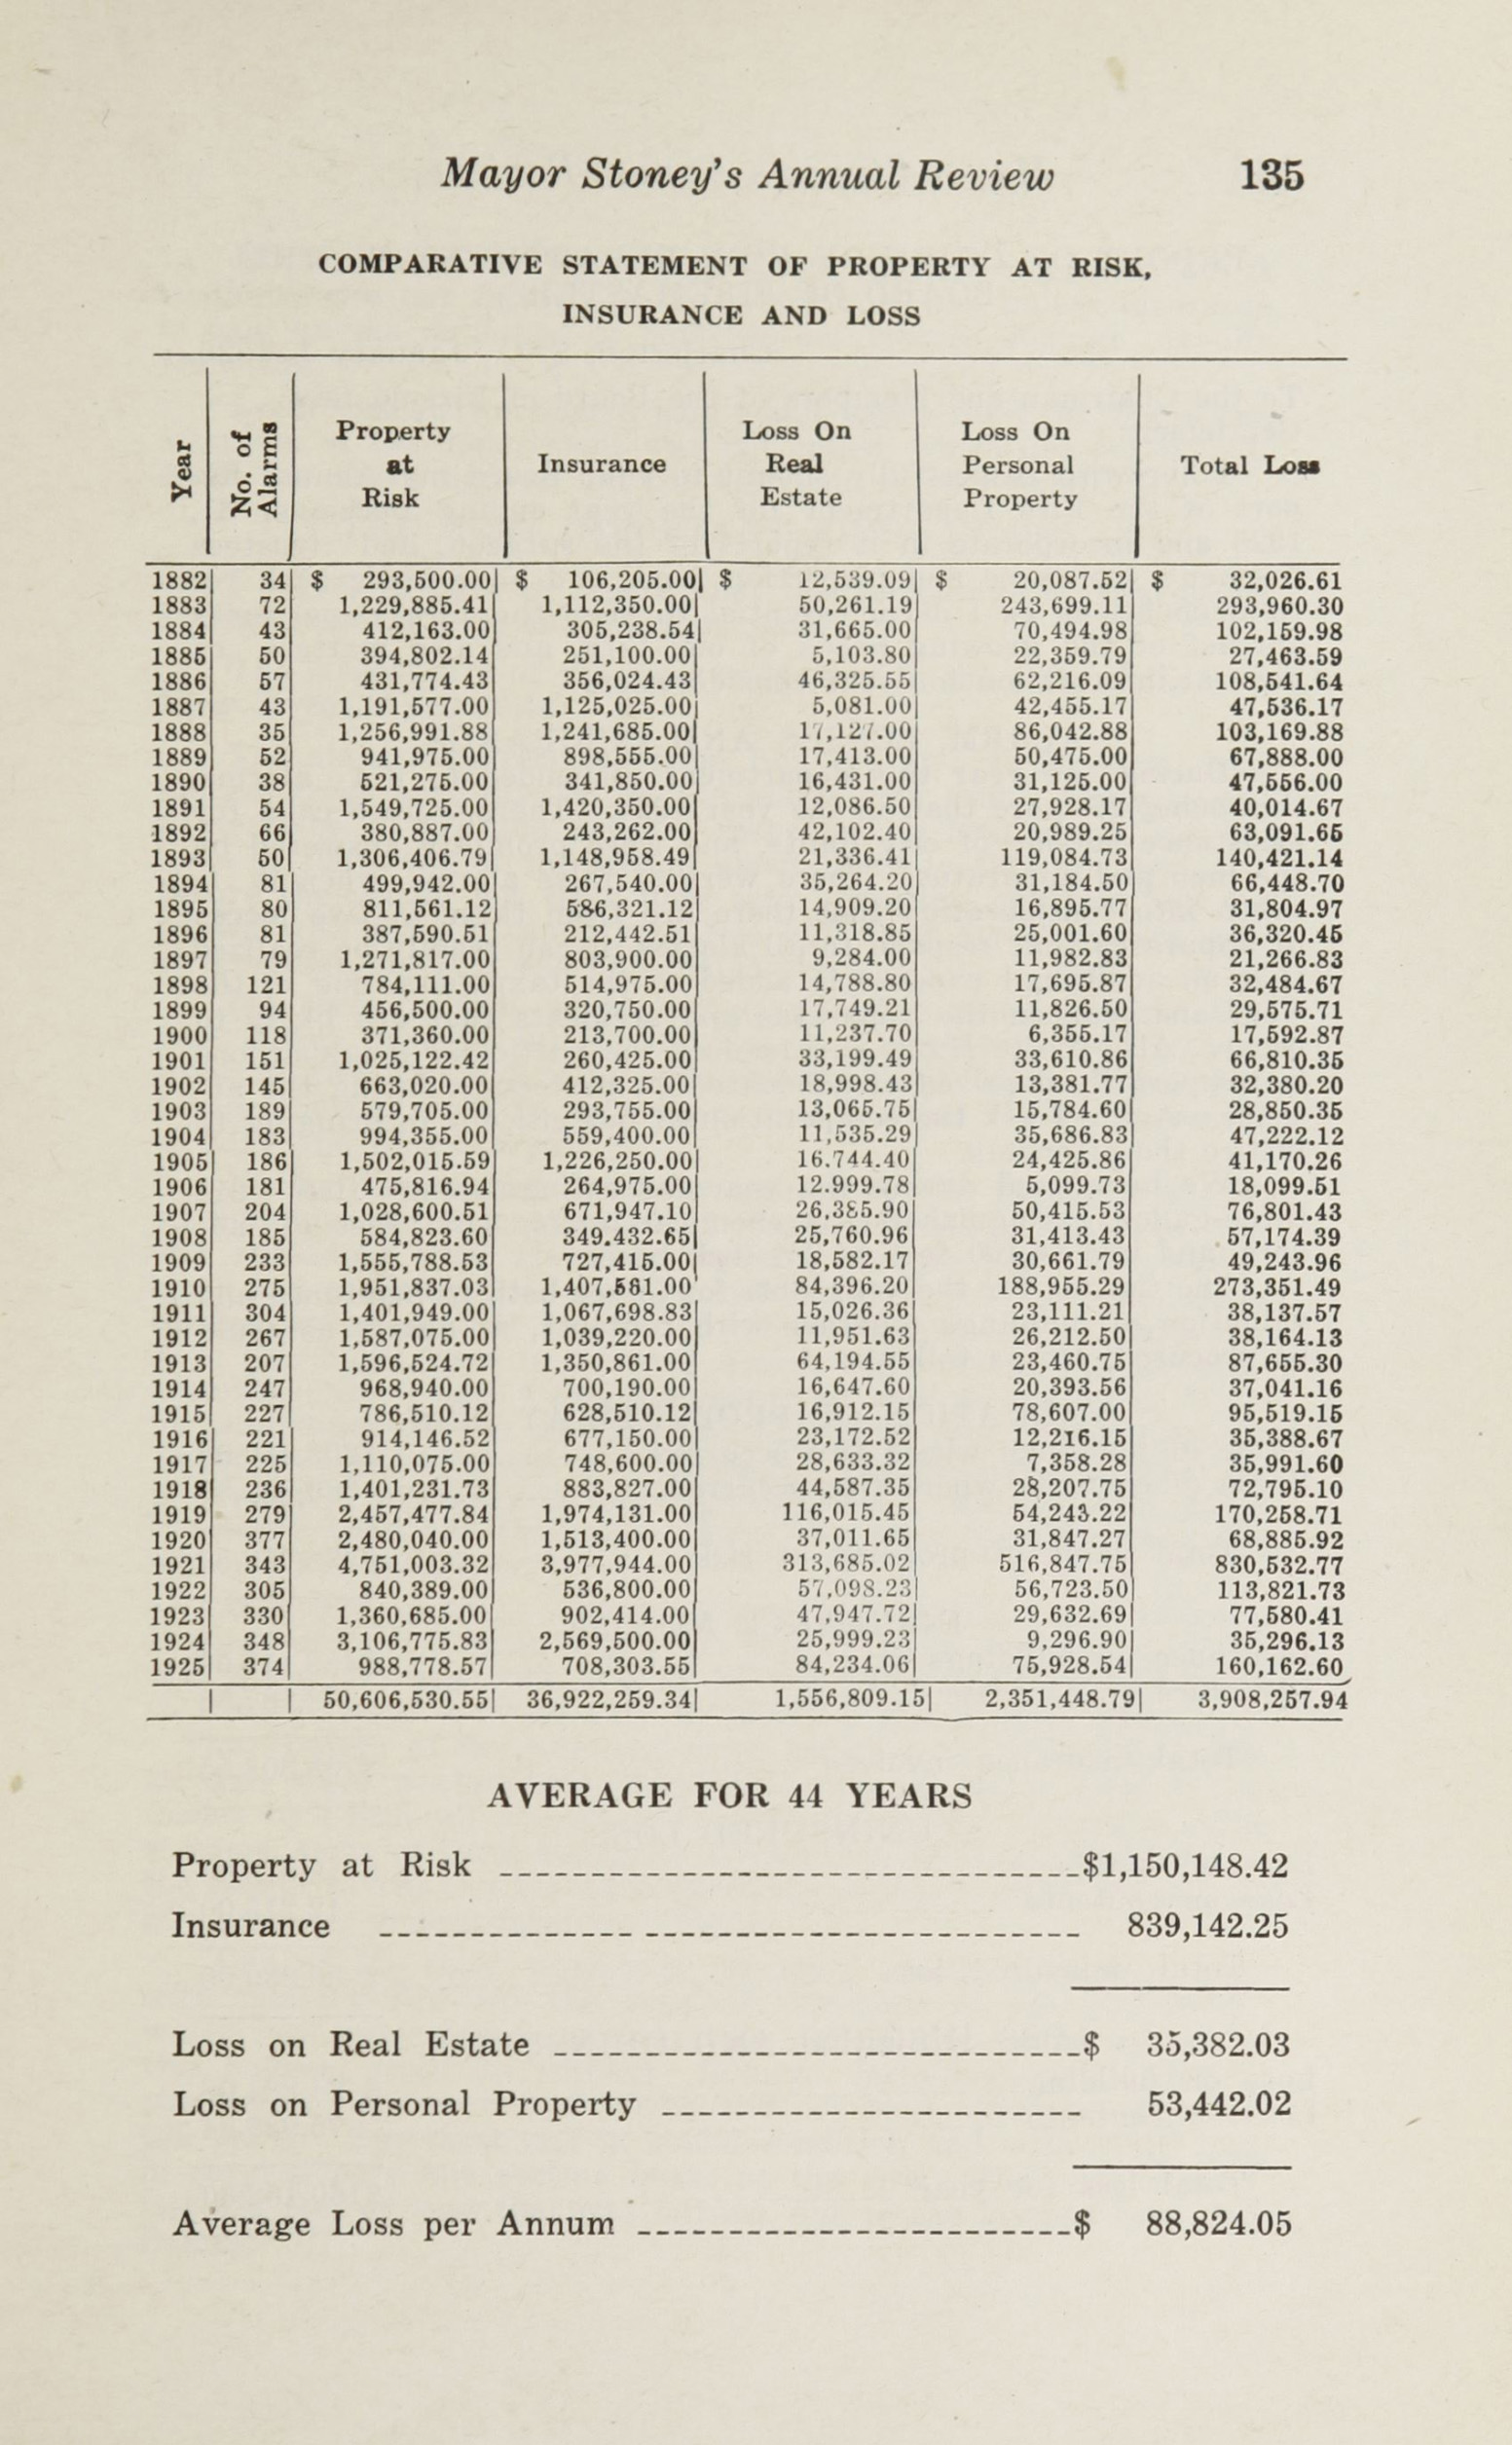 Charleston Yearbook, 1925, page 135